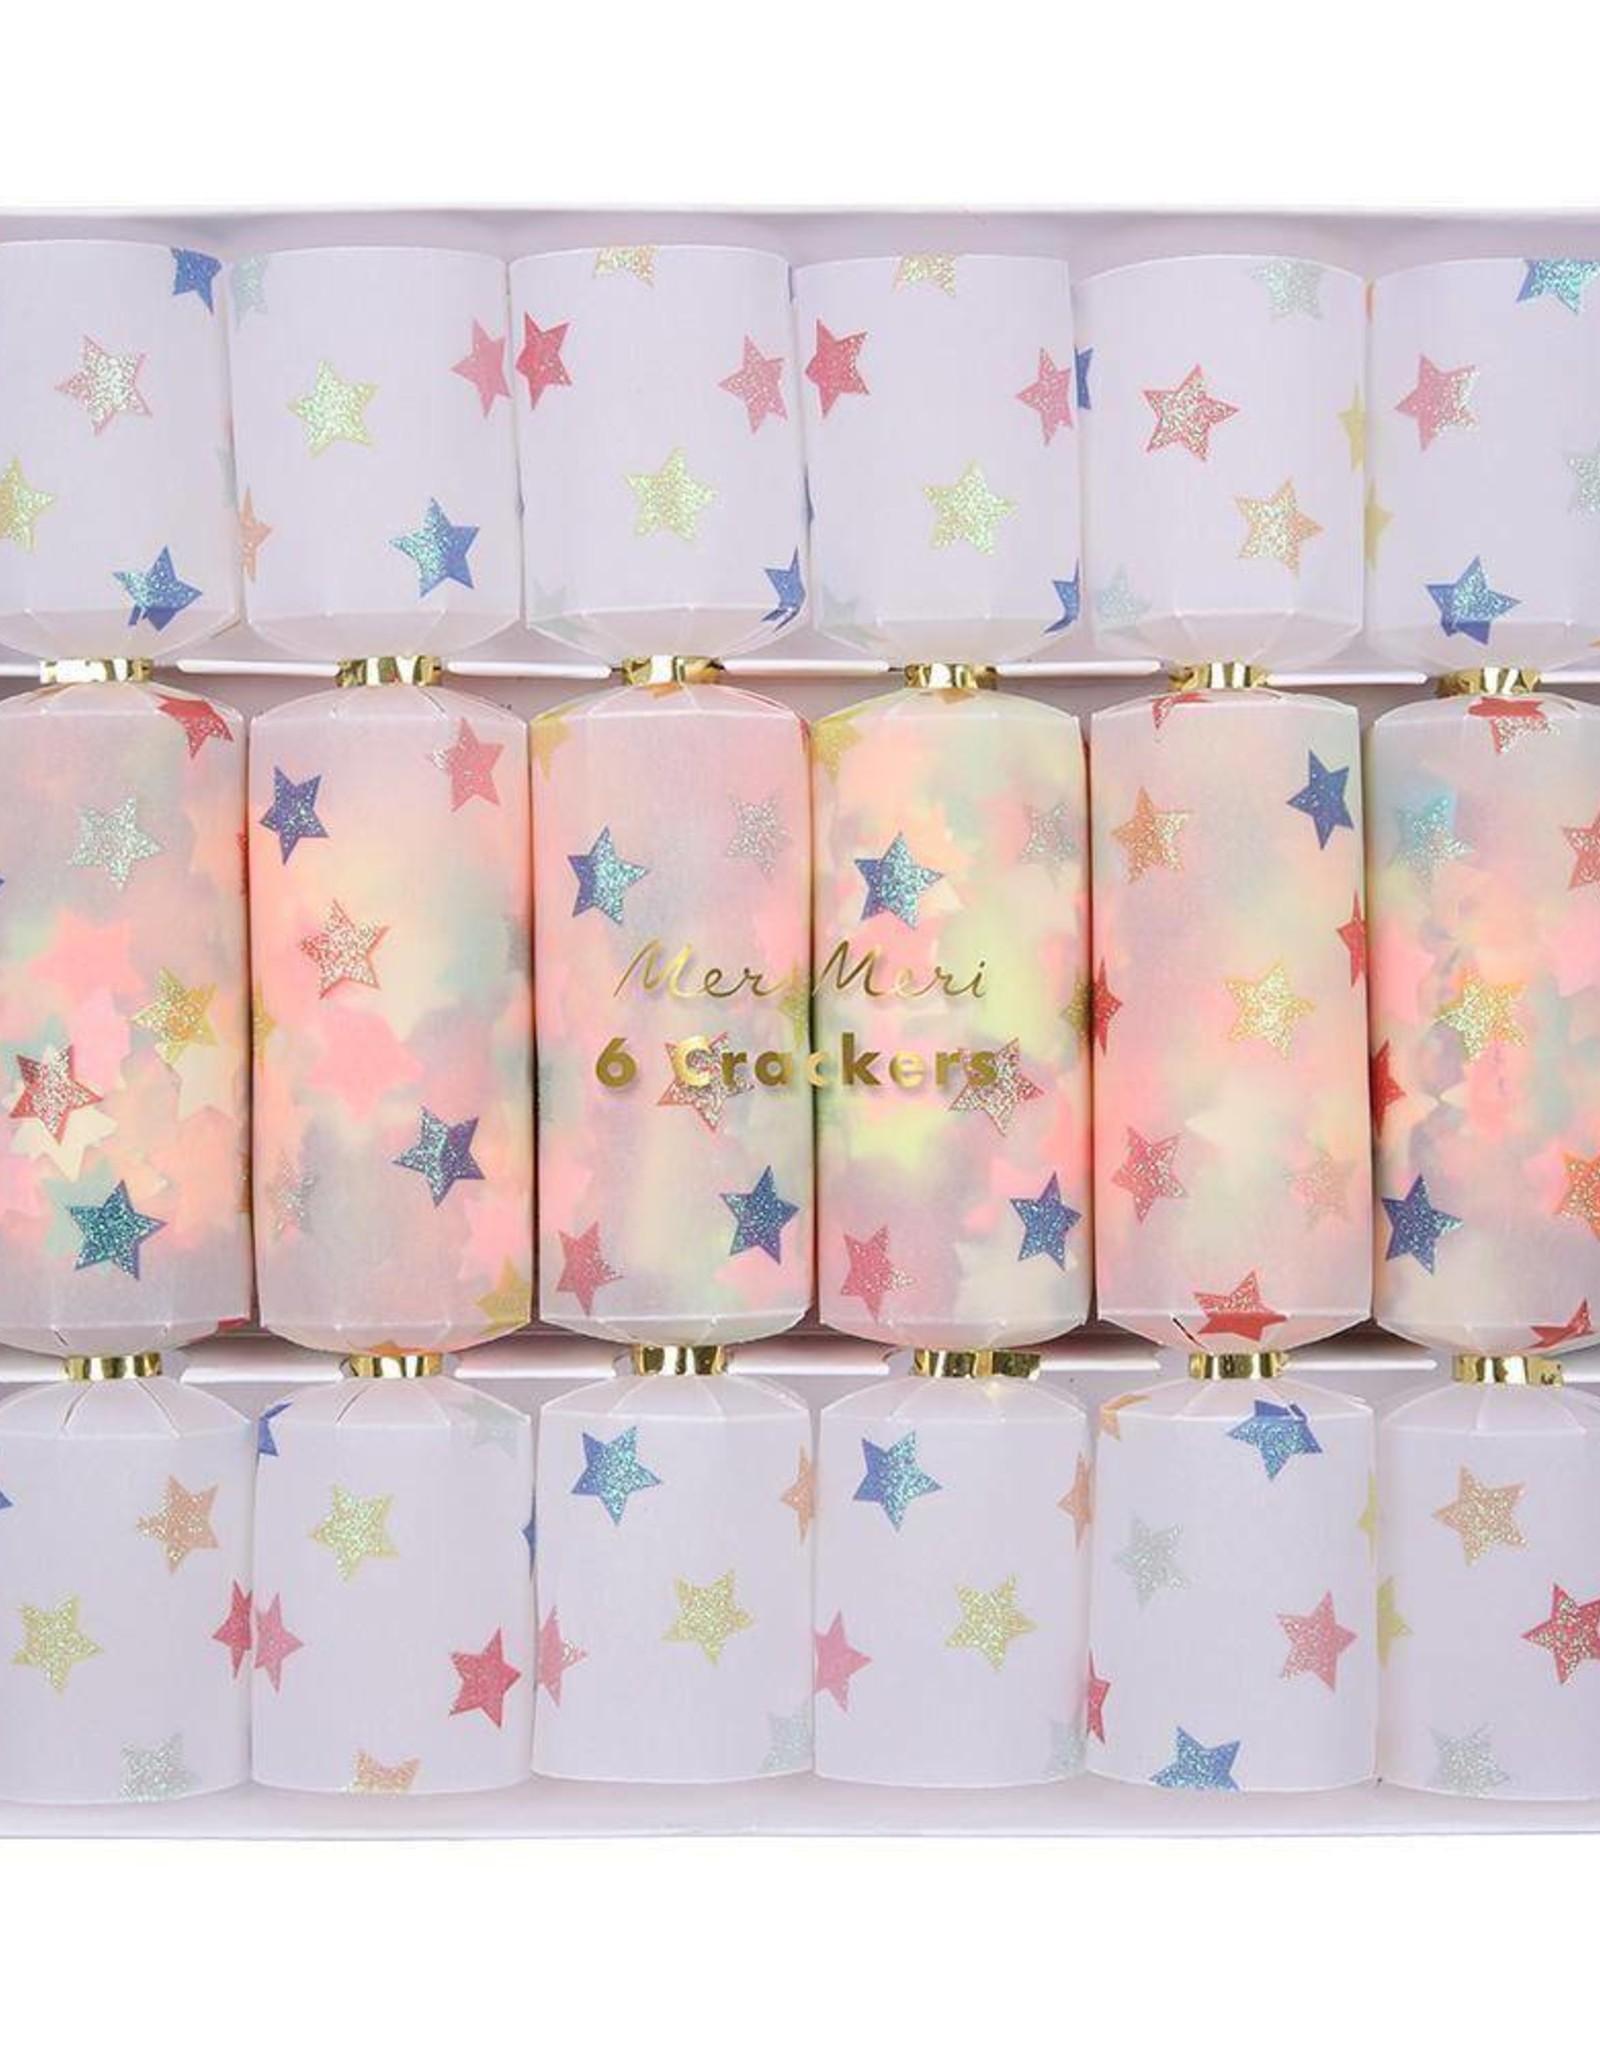 Meri Meri multi color star crackers